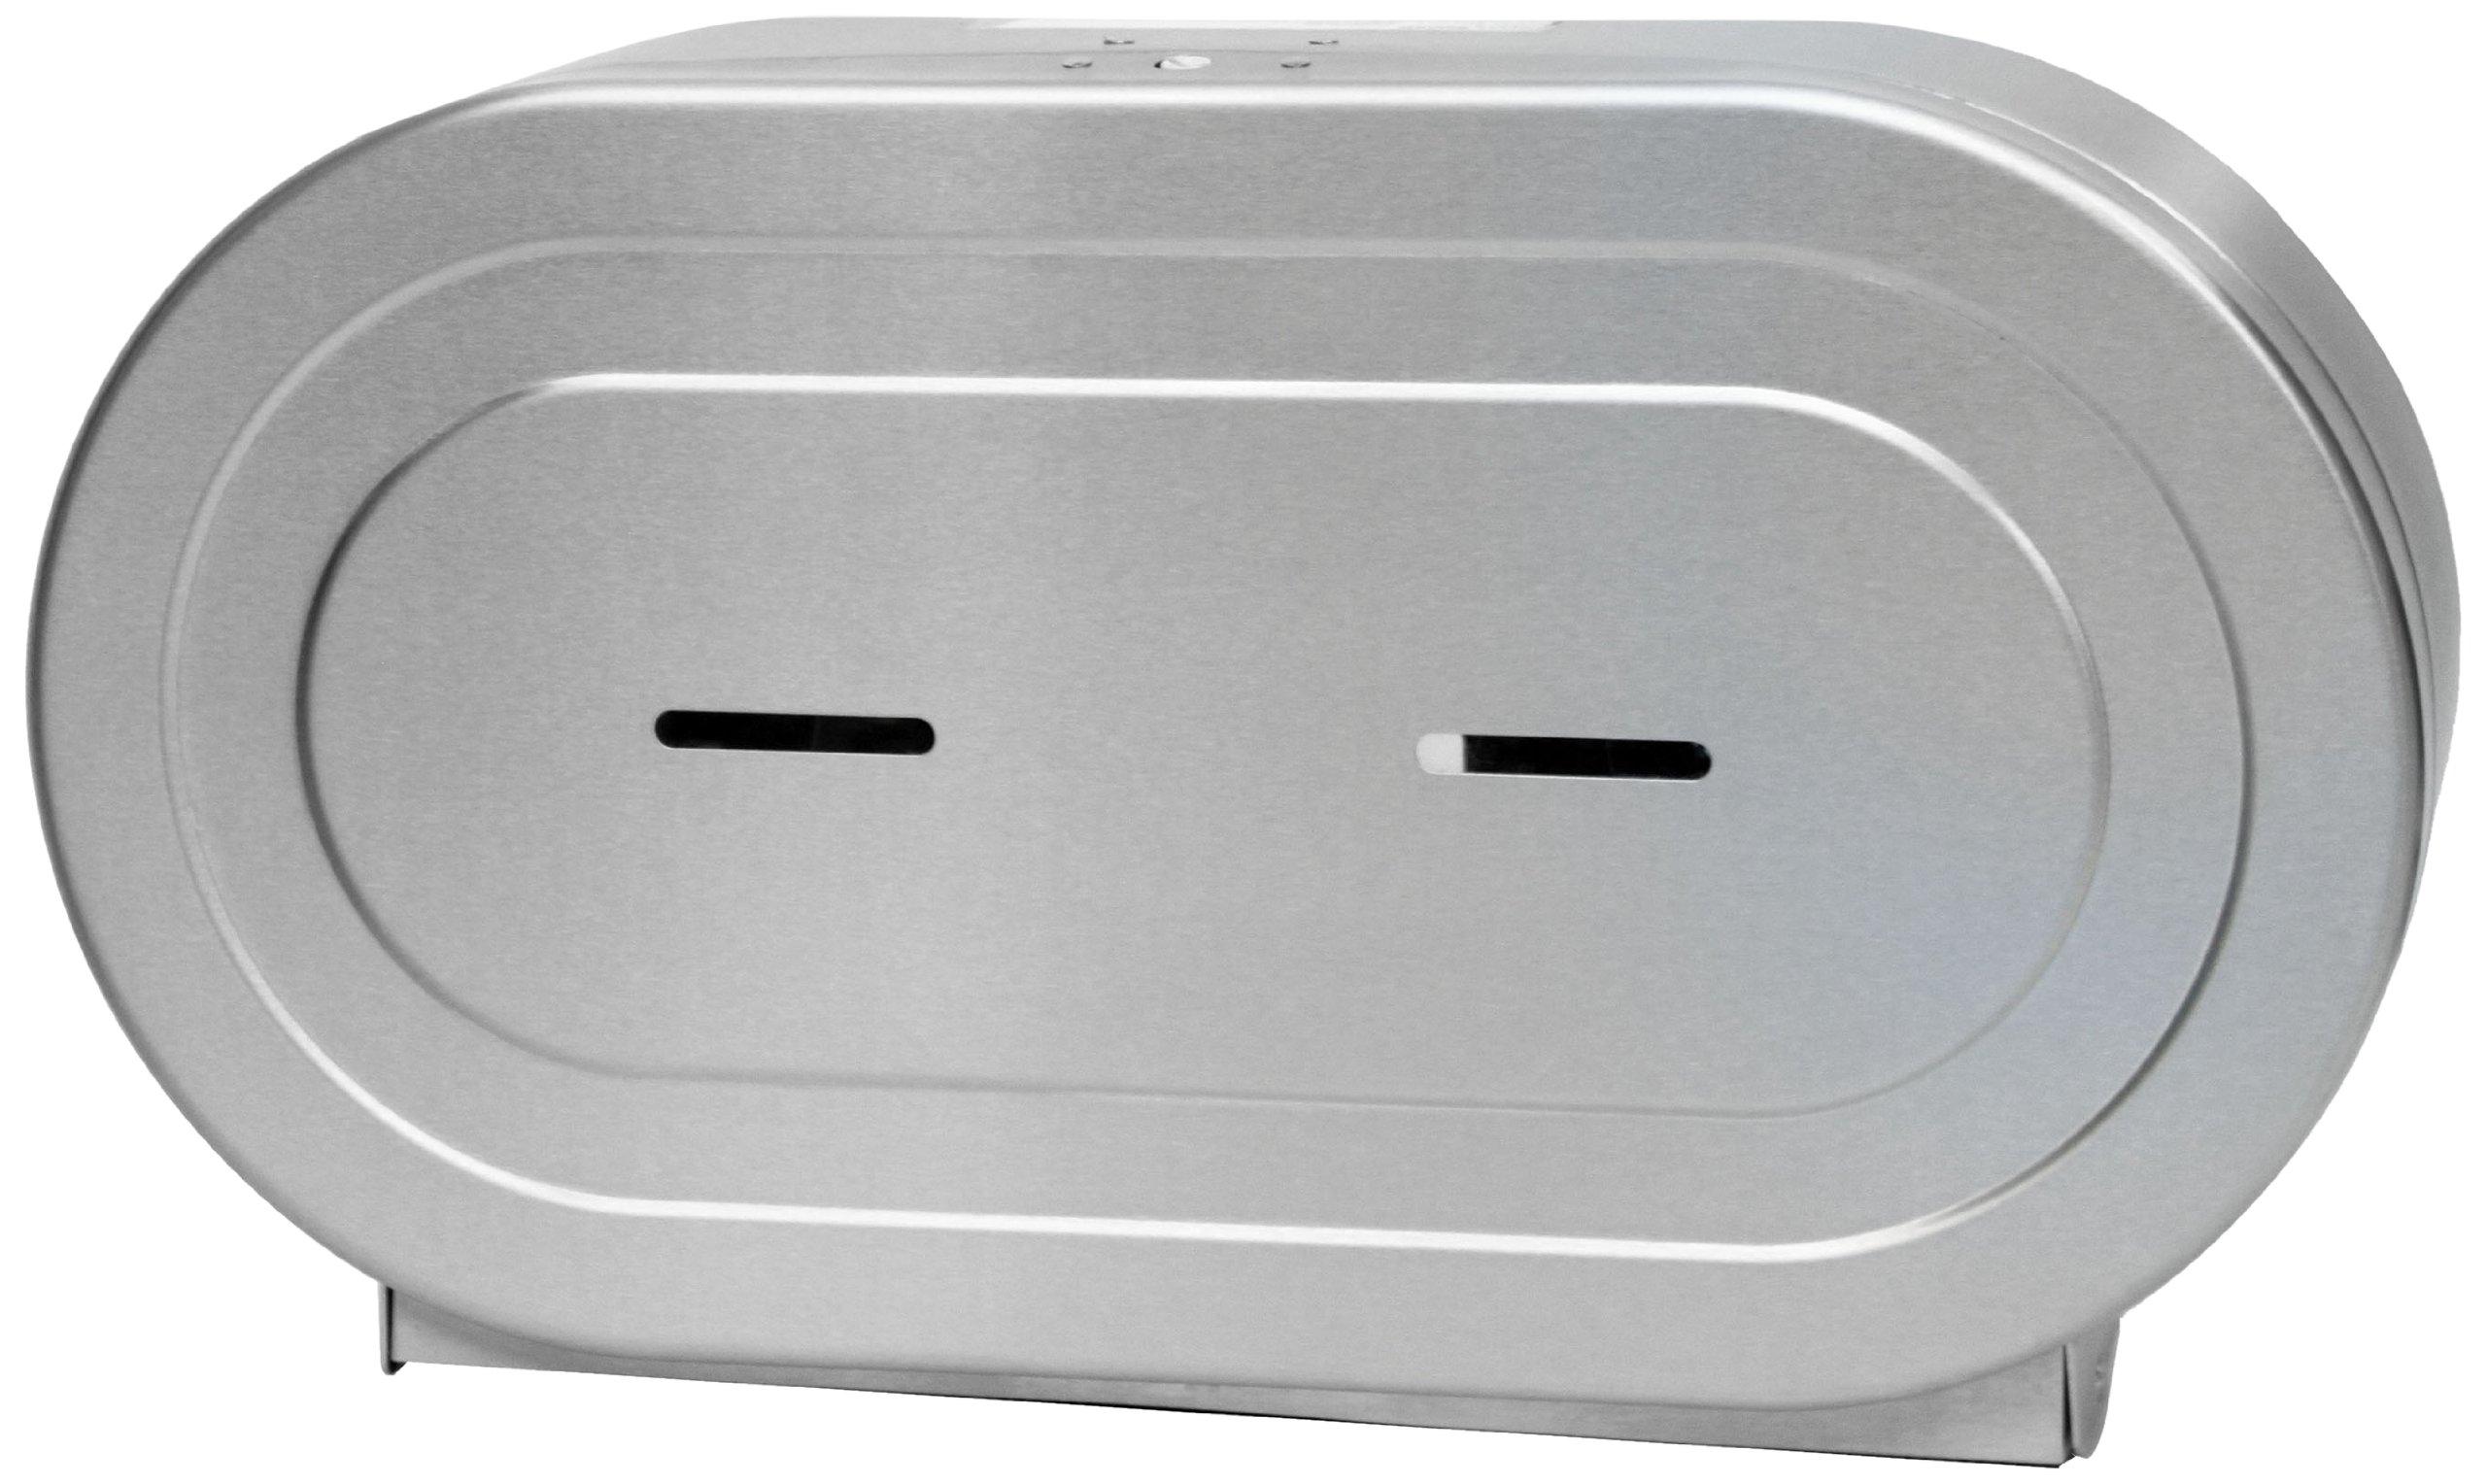 Palmer Fixture RD0327-09F Twin Jumbo Stainless Tissue Dispenser, Brushed Stainless by Palmer Fixture